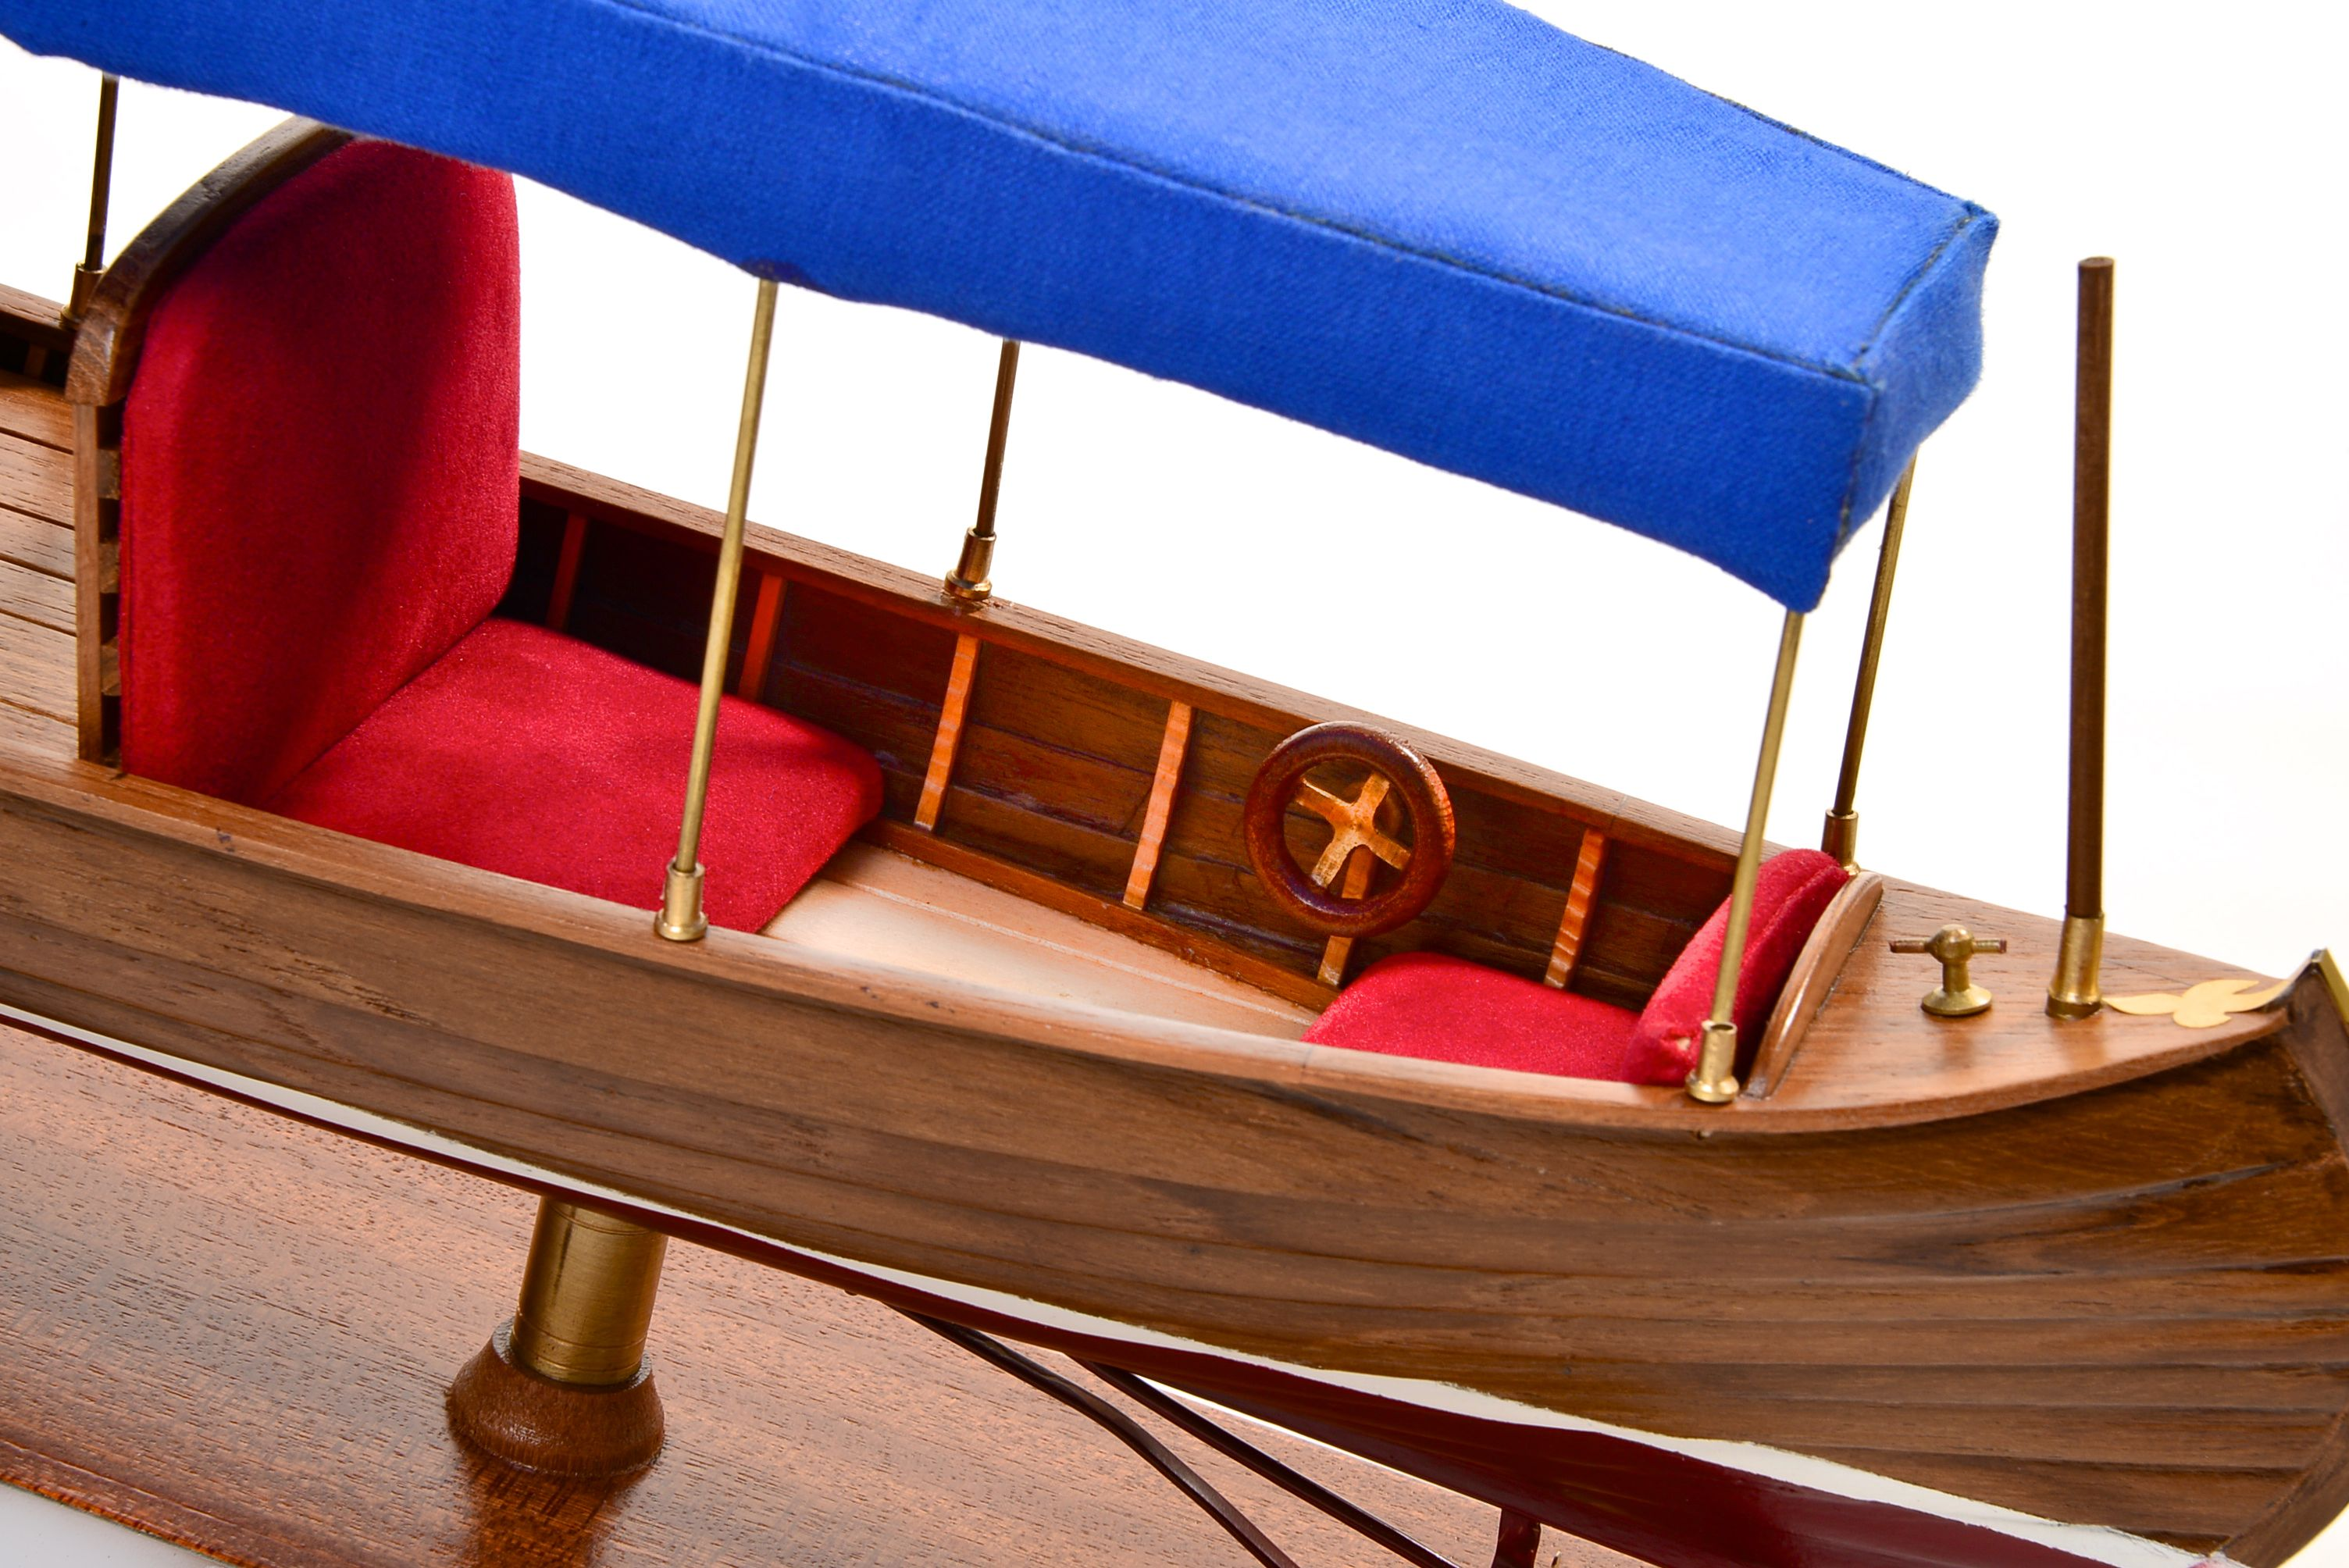 1865-11232-Liddesdale-Electric-Canoe-1920